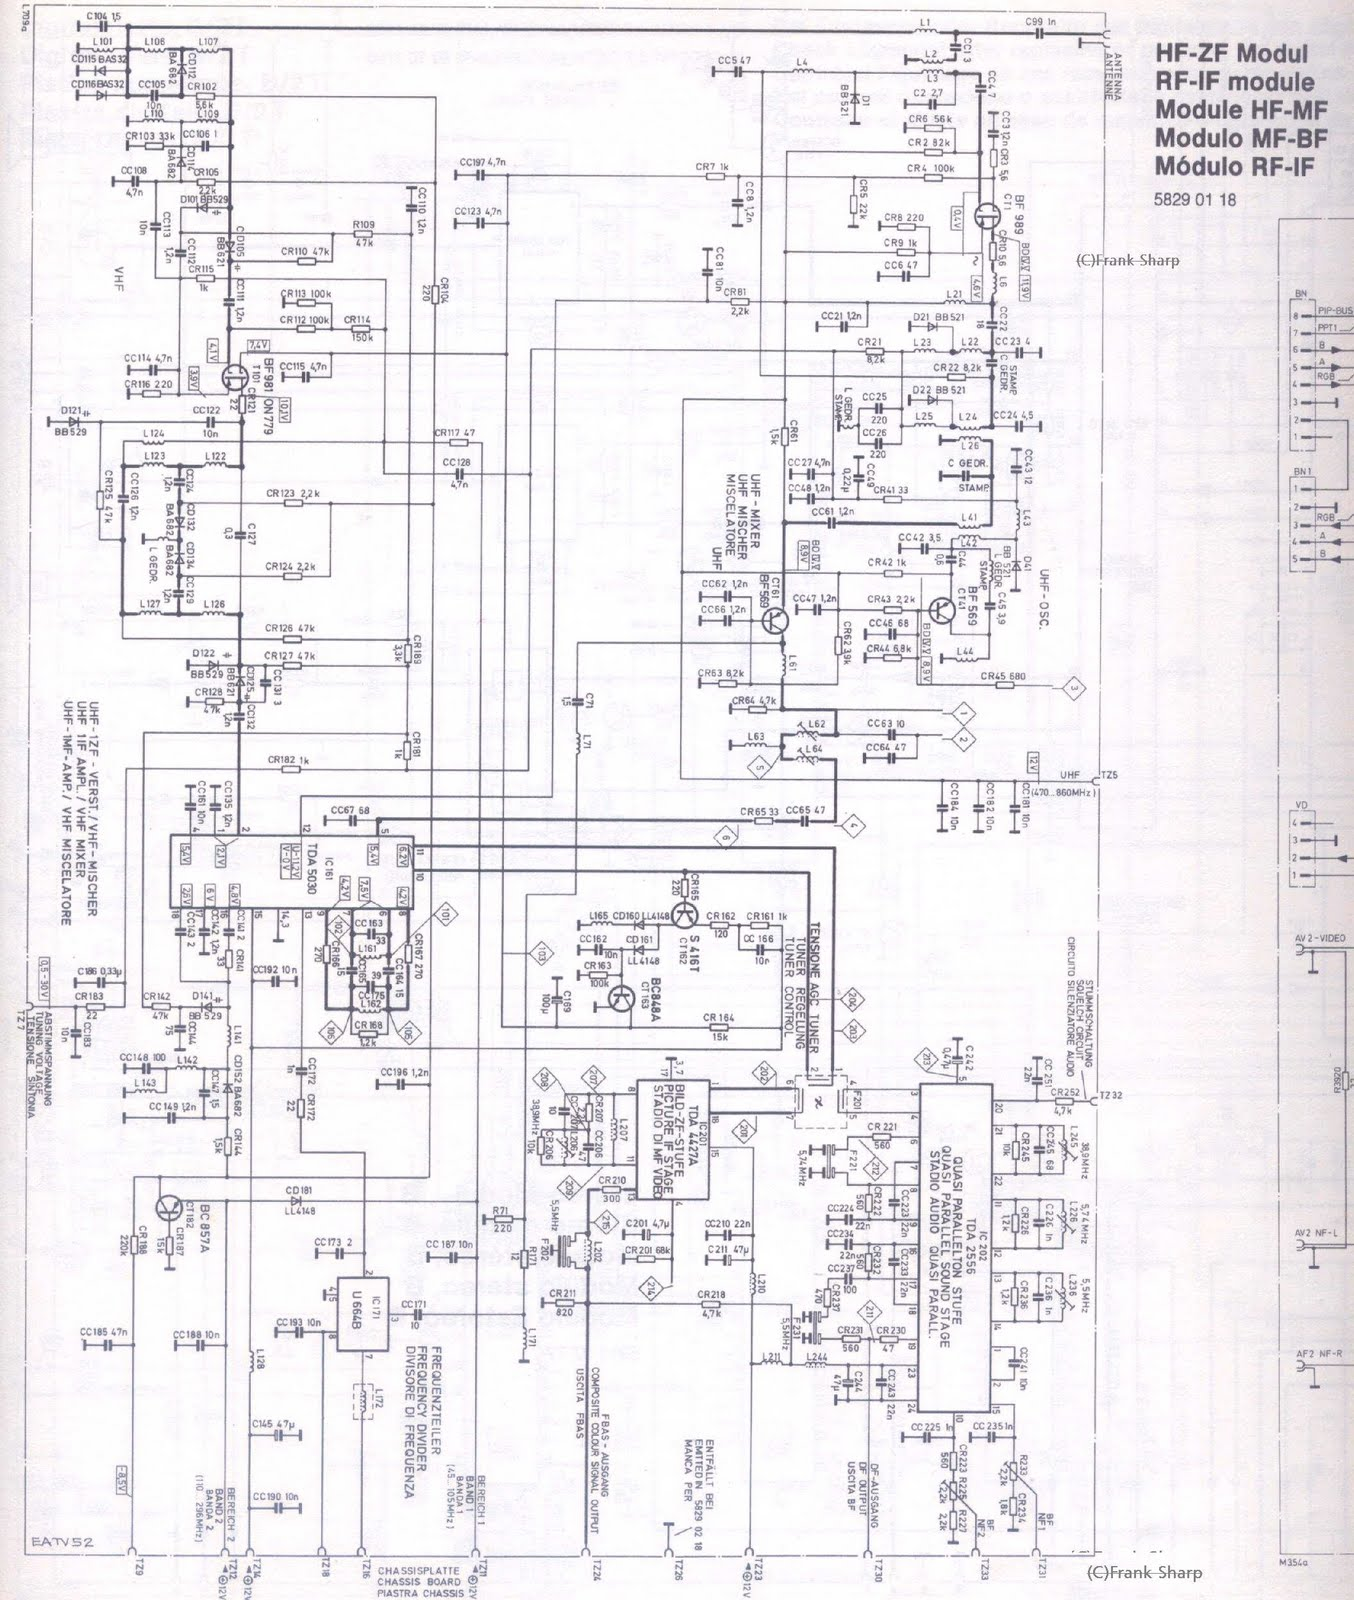 Obsolete Technology Tellye !: ITT NOKIA DIGIVISION 7170 VT